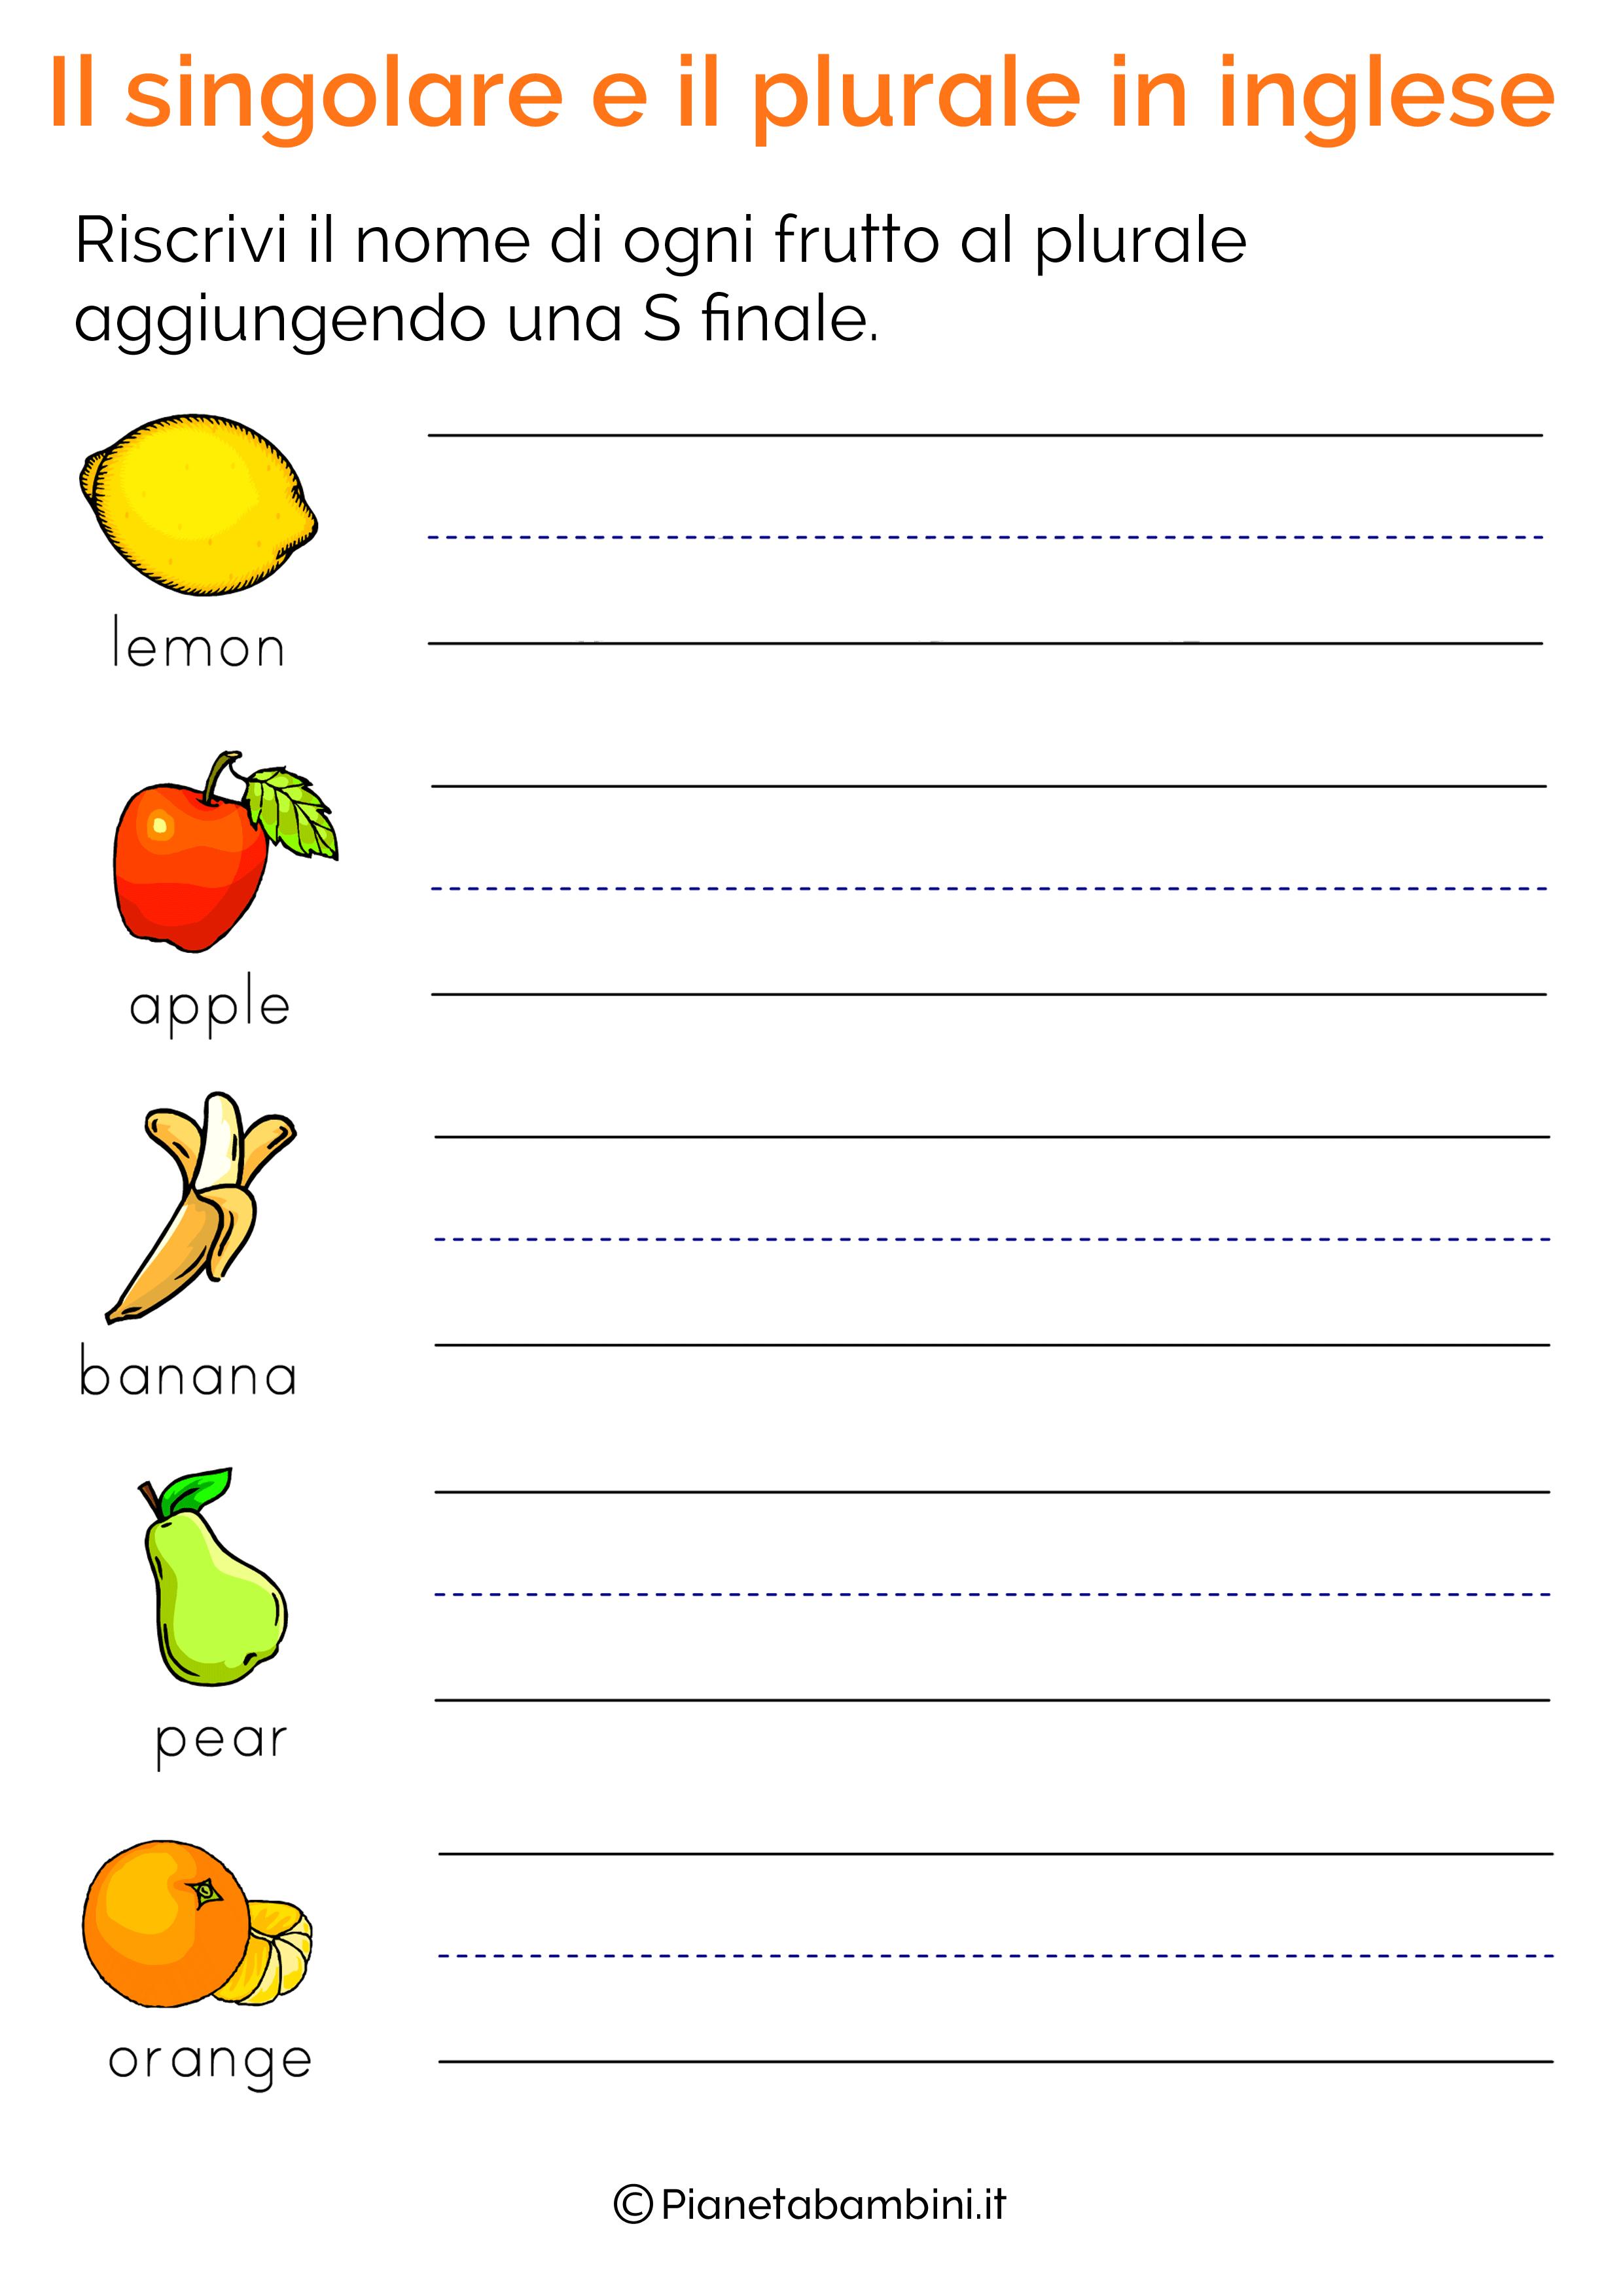 homework plurale o singolare